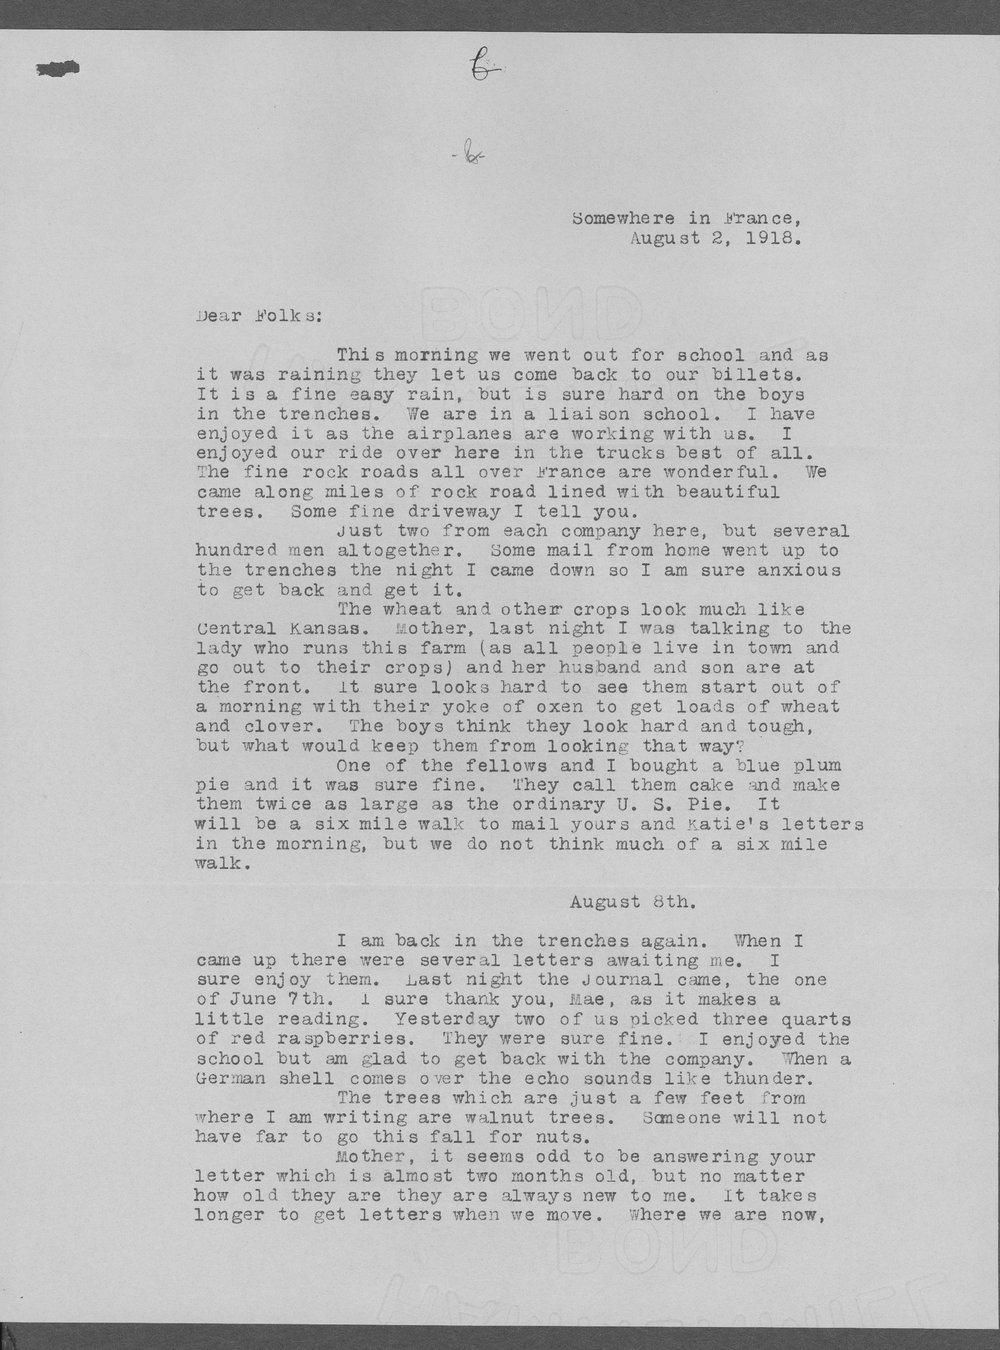 Merle Daniel Sellers, World War I soldier - 9